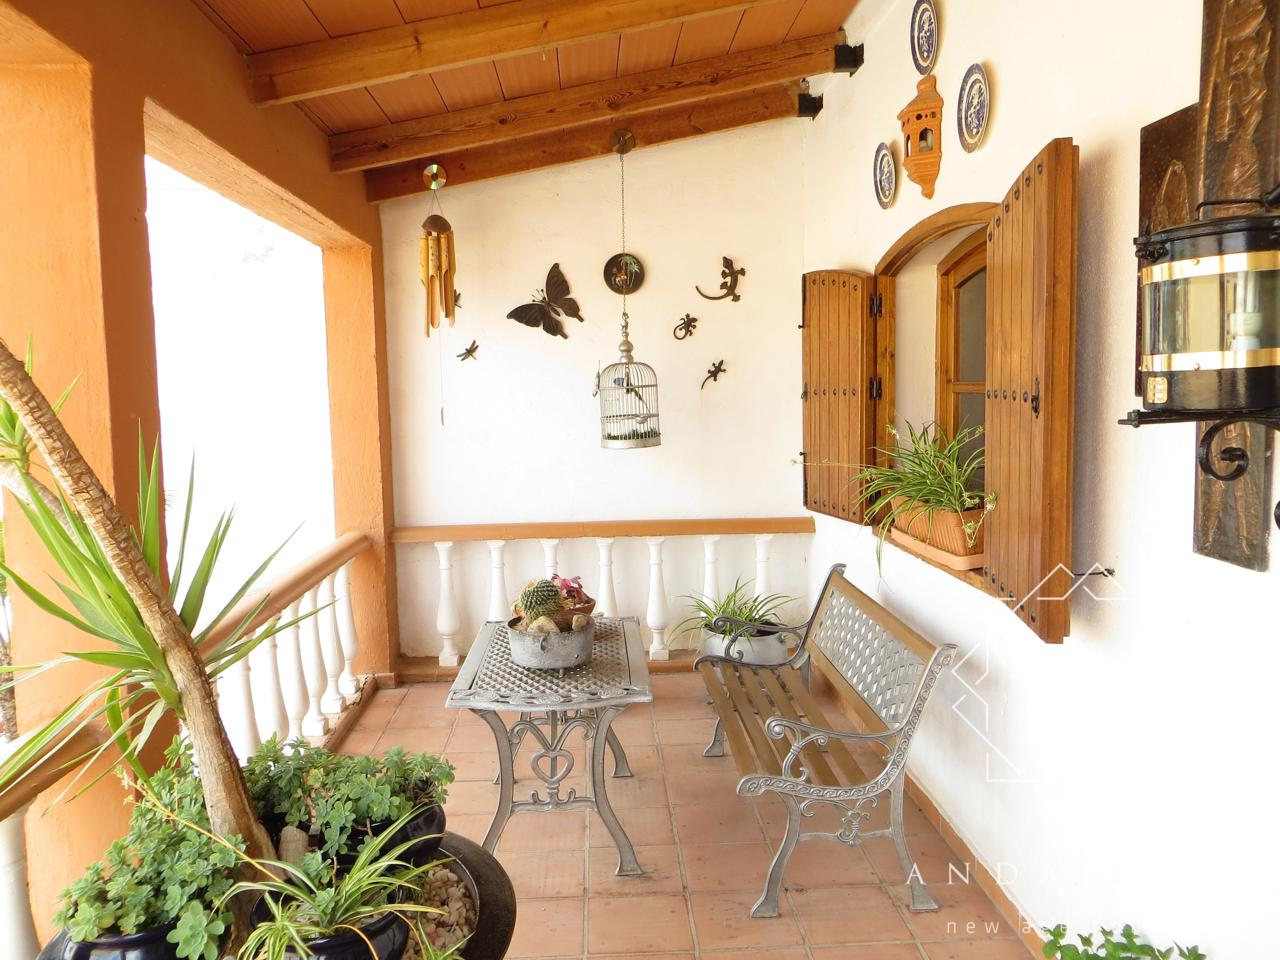 Casa / chalet Diseminado Huerta Don Juan, Los Gallardos